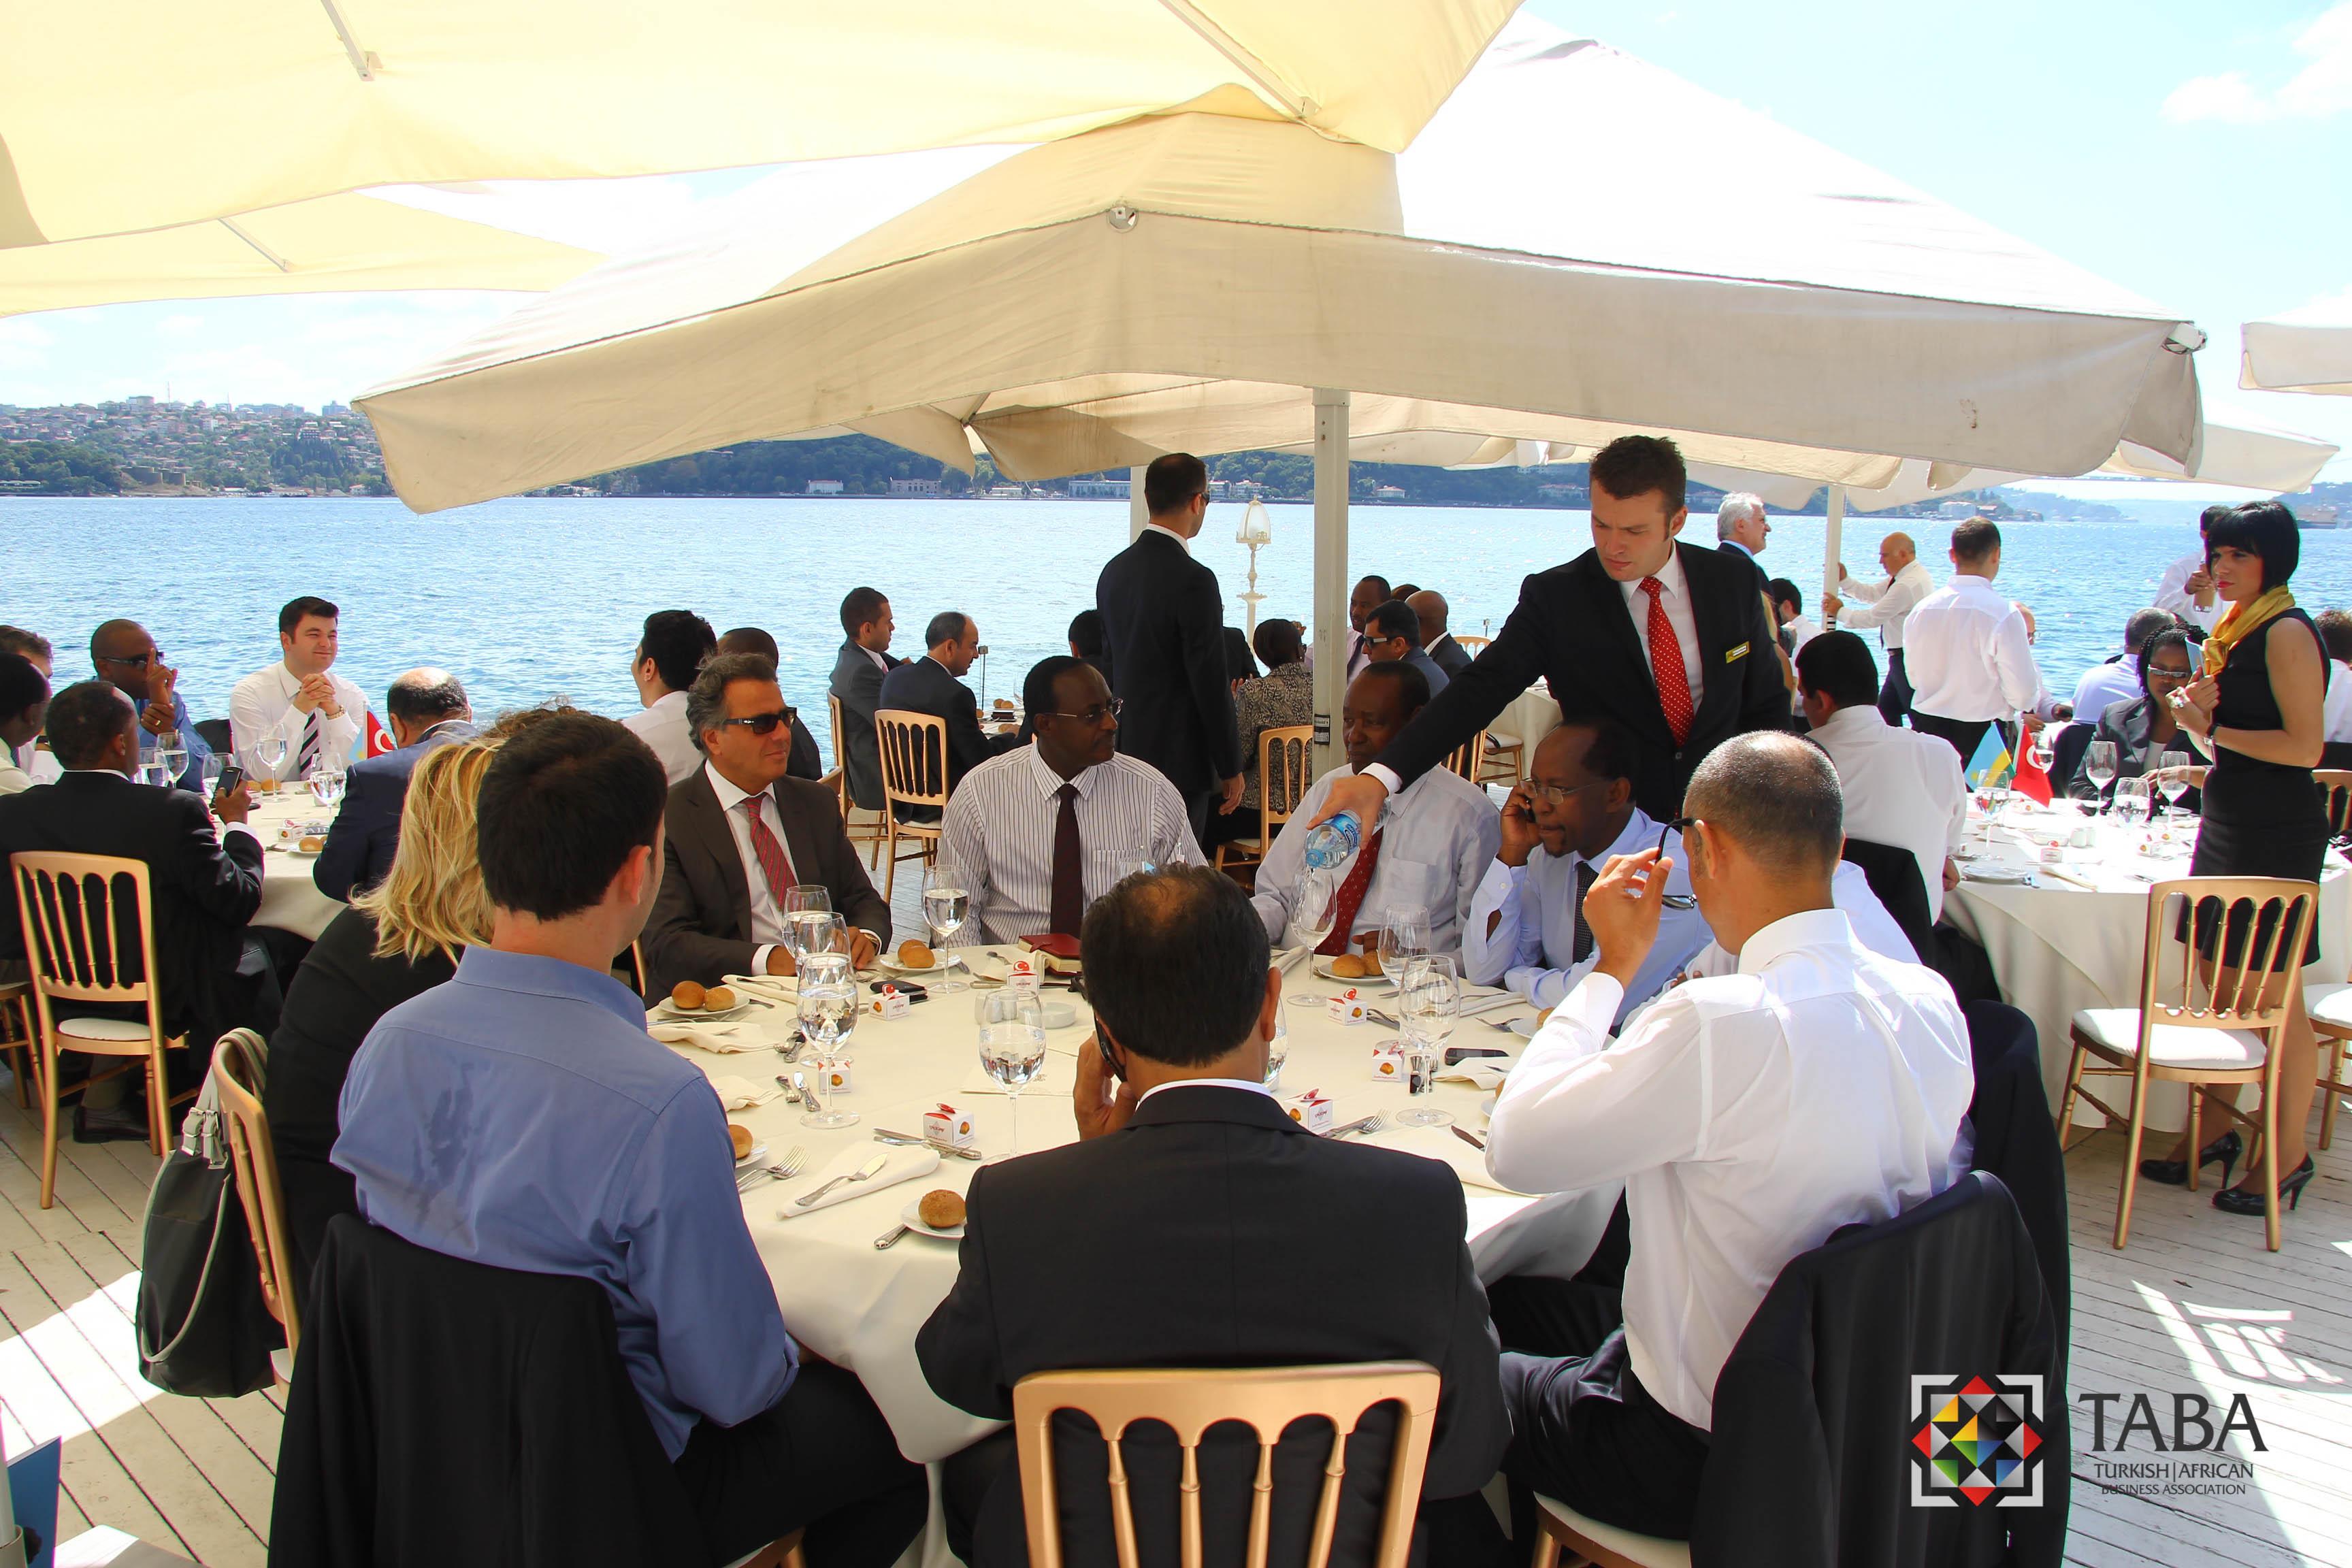 TABA Türk Afrika Turkish African